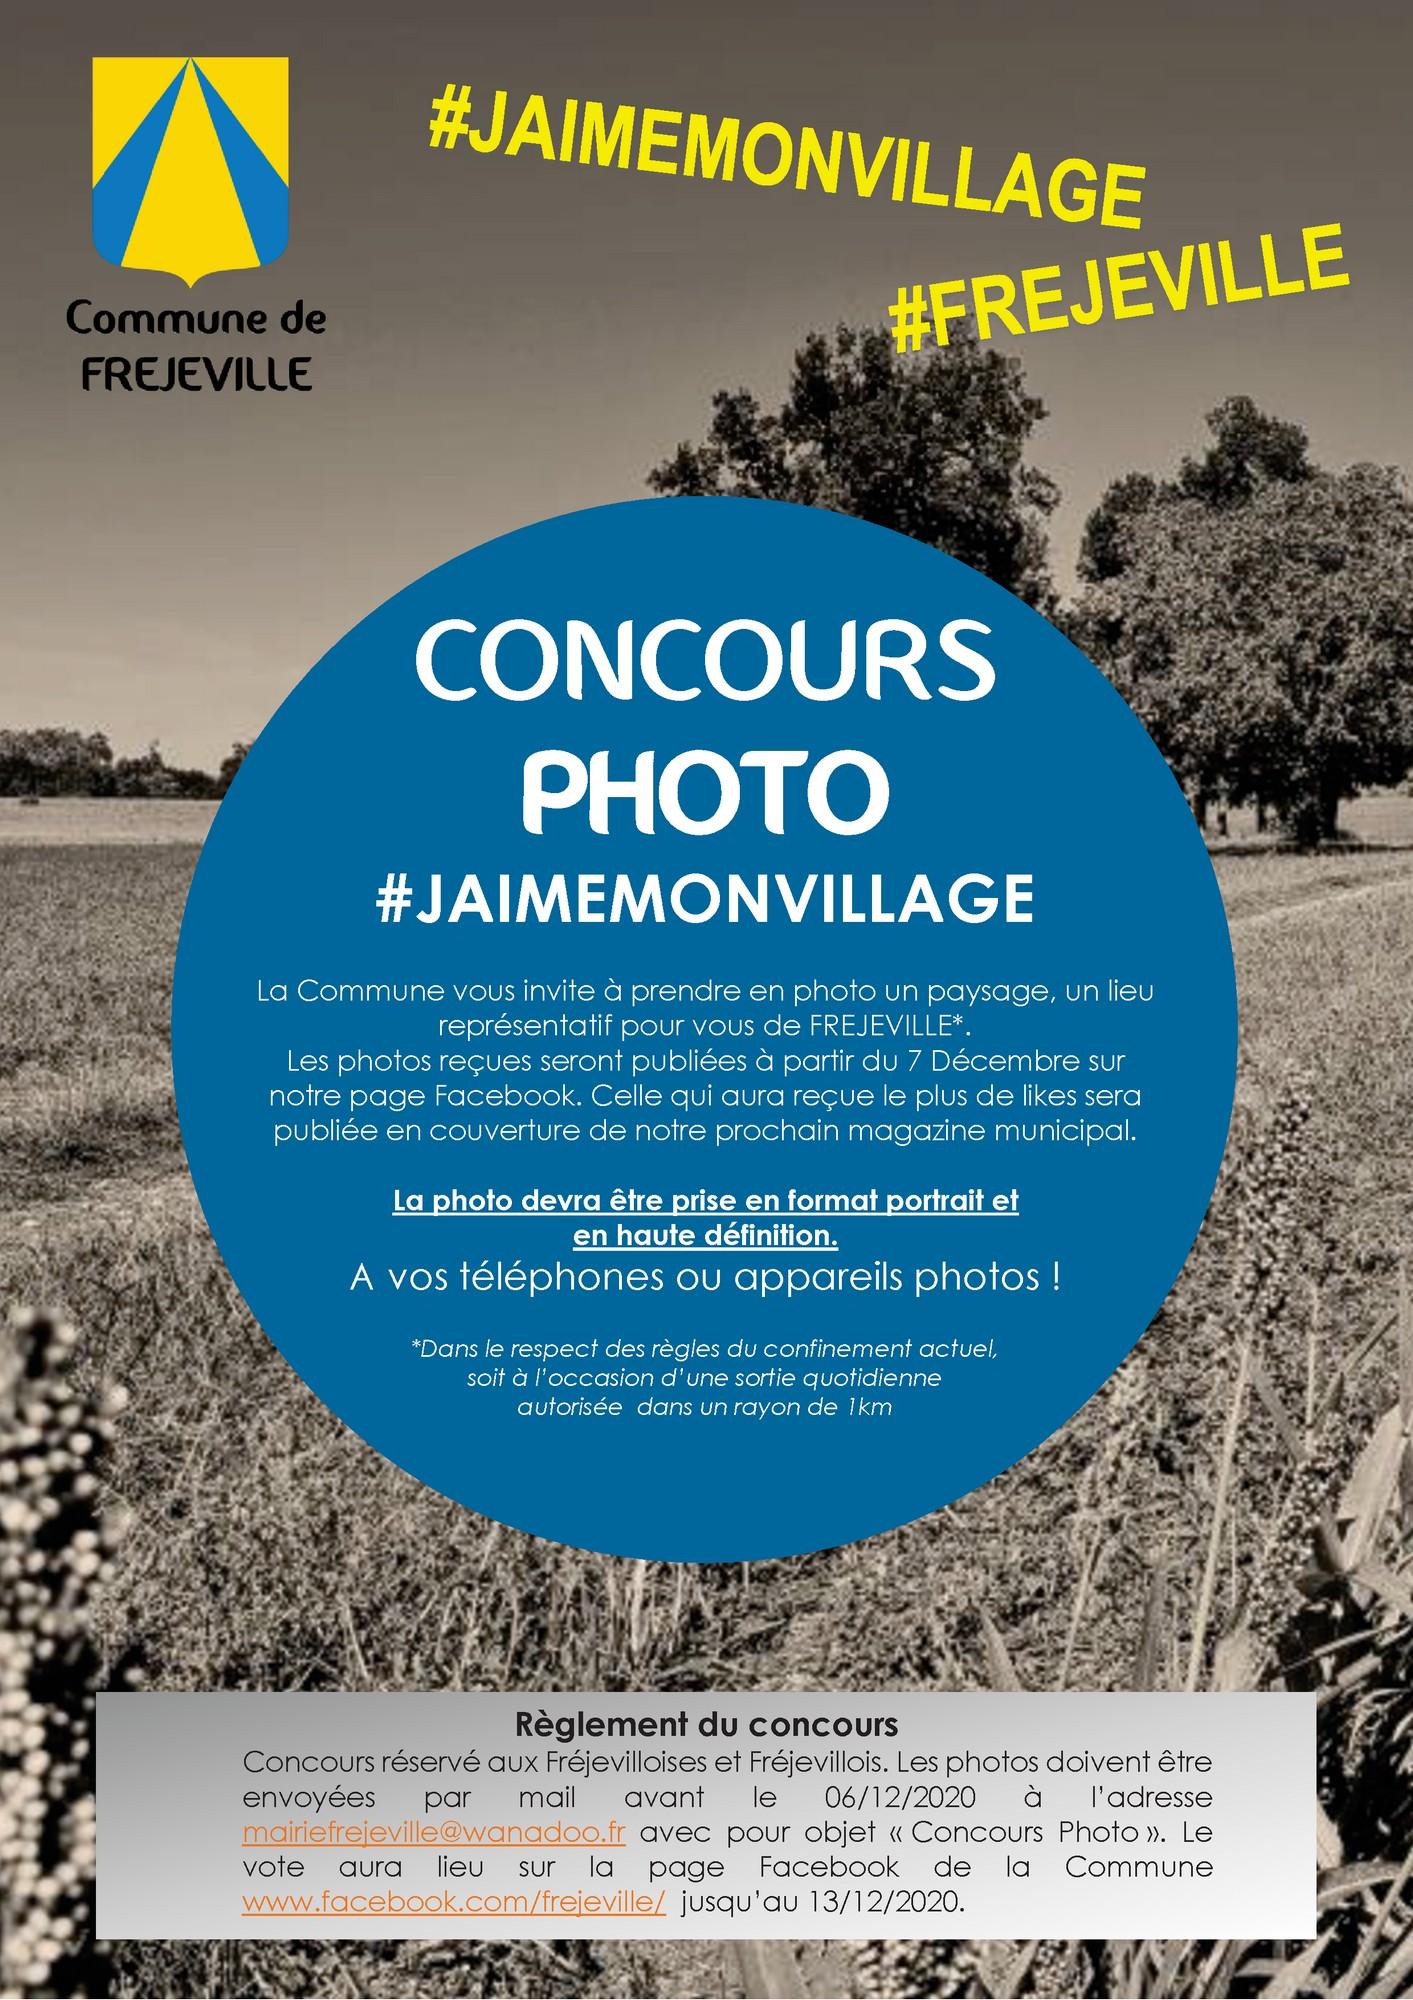 Concours photo Lou vilatge 2020.jpg